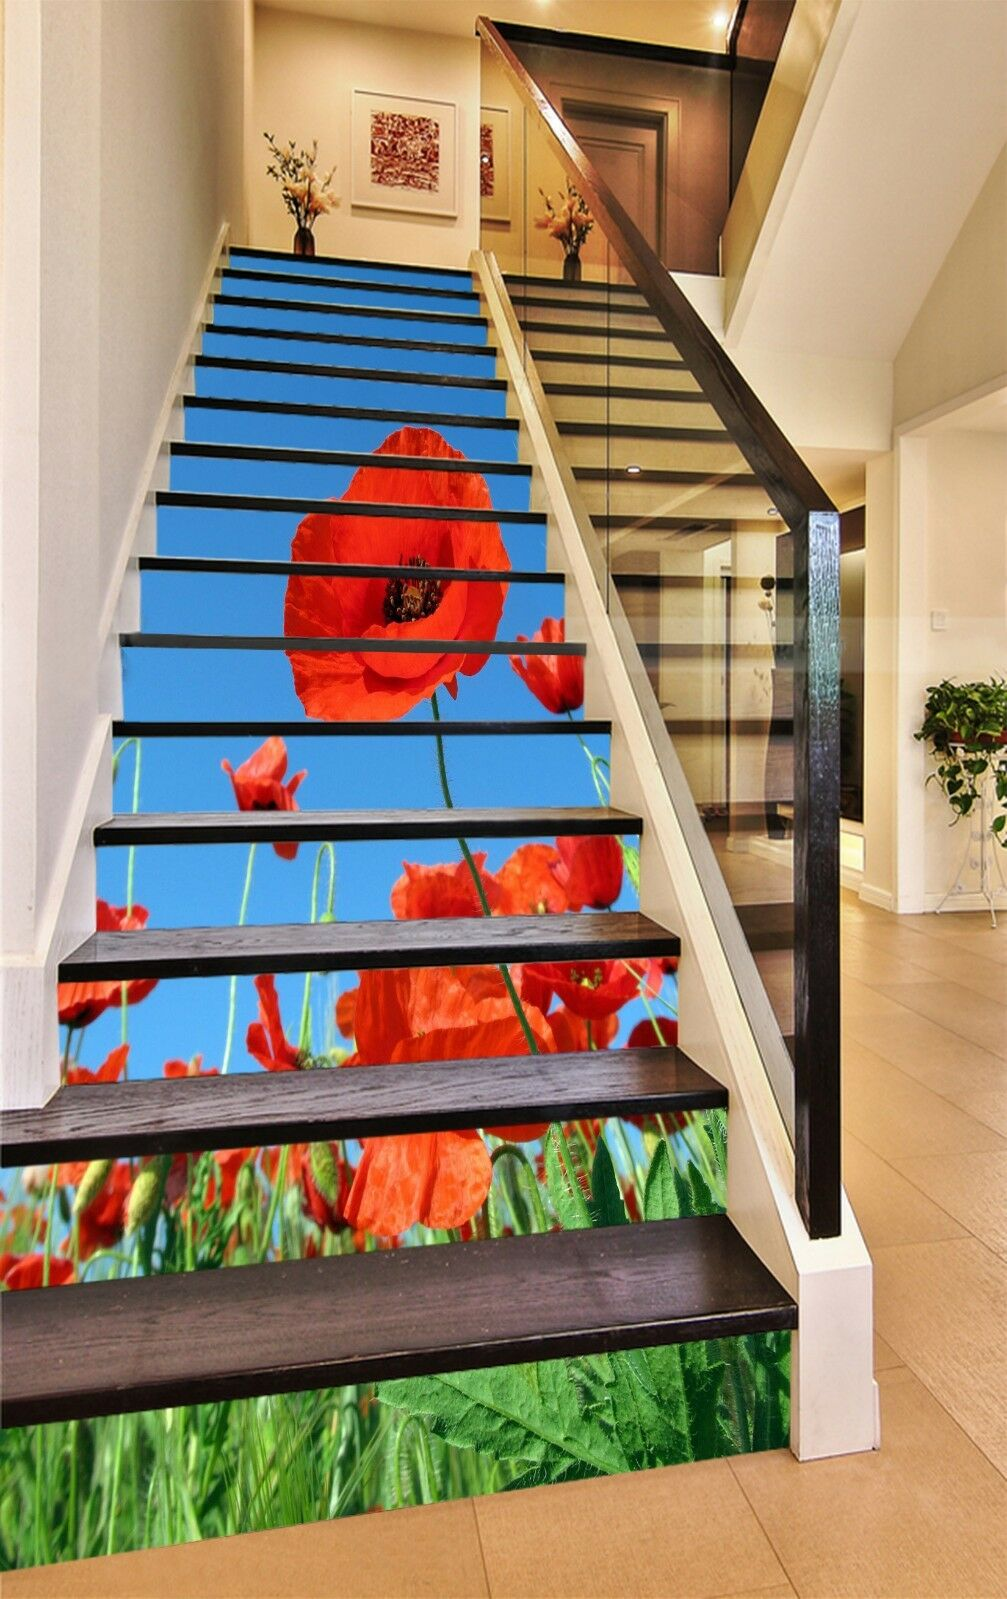 3D rot Field Flower Stair Risers Decoration Photo Mural Vinyl Decal WandPapier UK